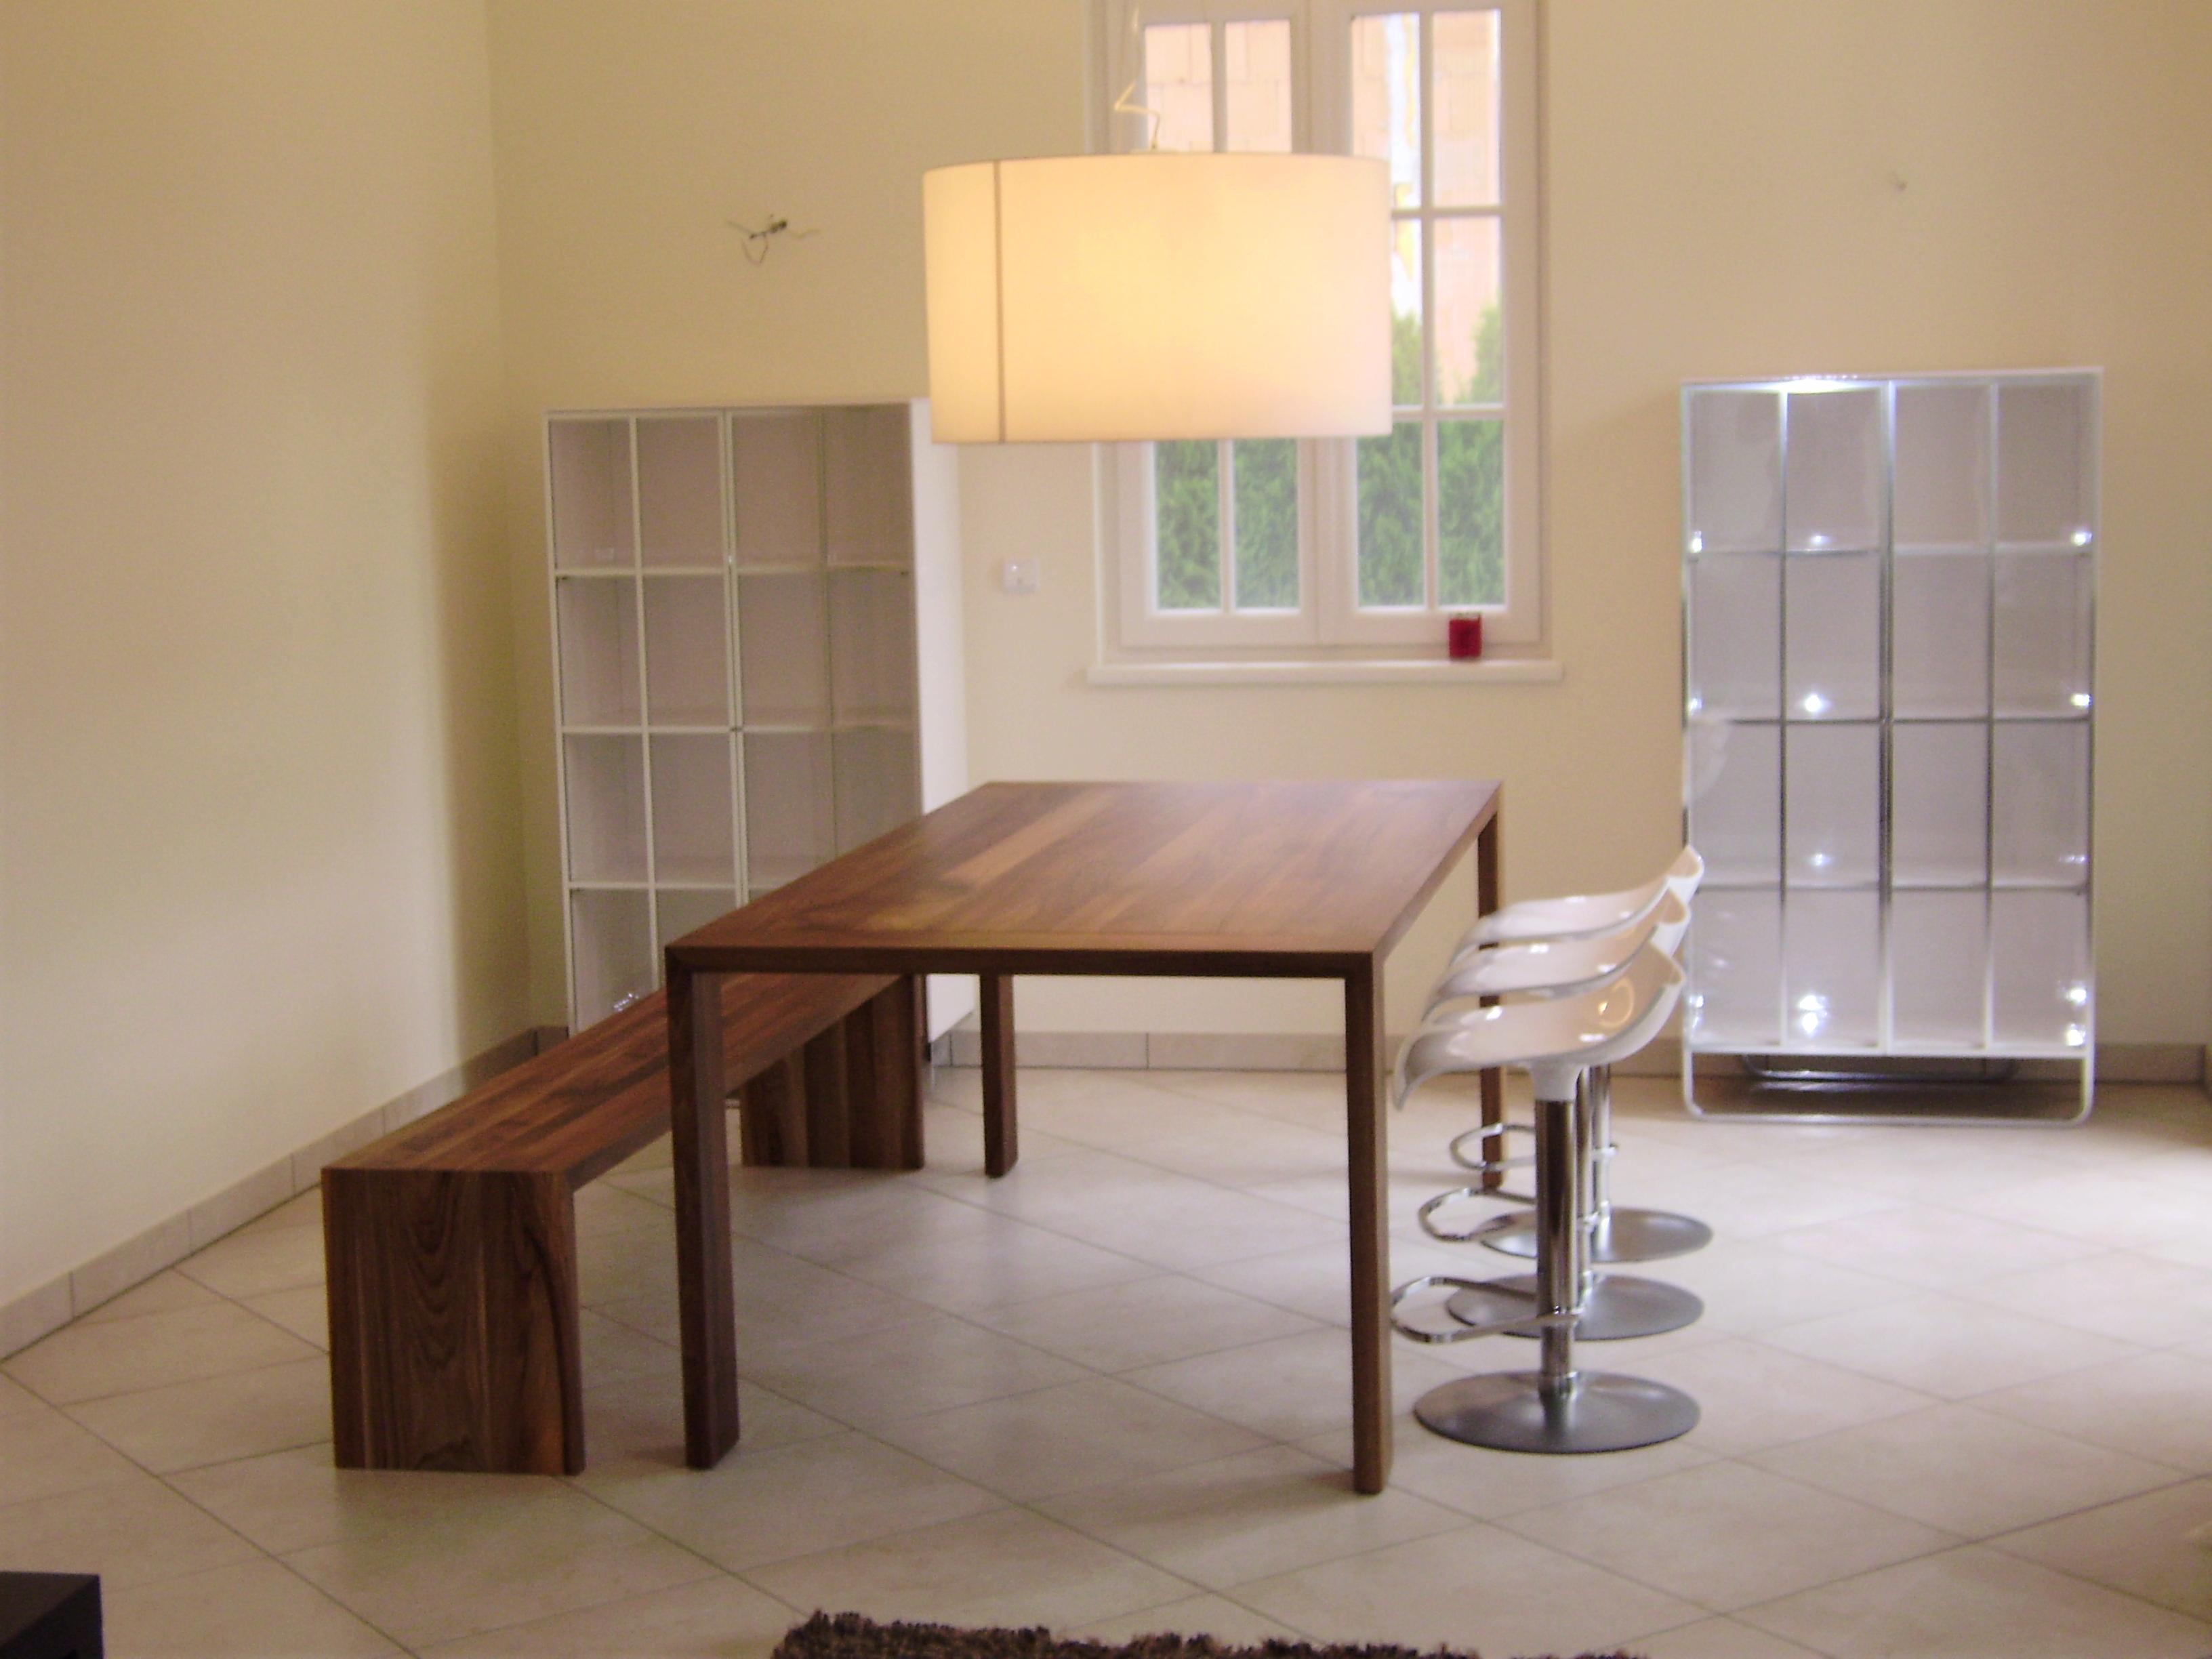 design by ligne roset essplatz mod eaton in nu baum barhocker mod pam die sp ter in die. Black Bedroom Furniture Sets. Home Design Ideas